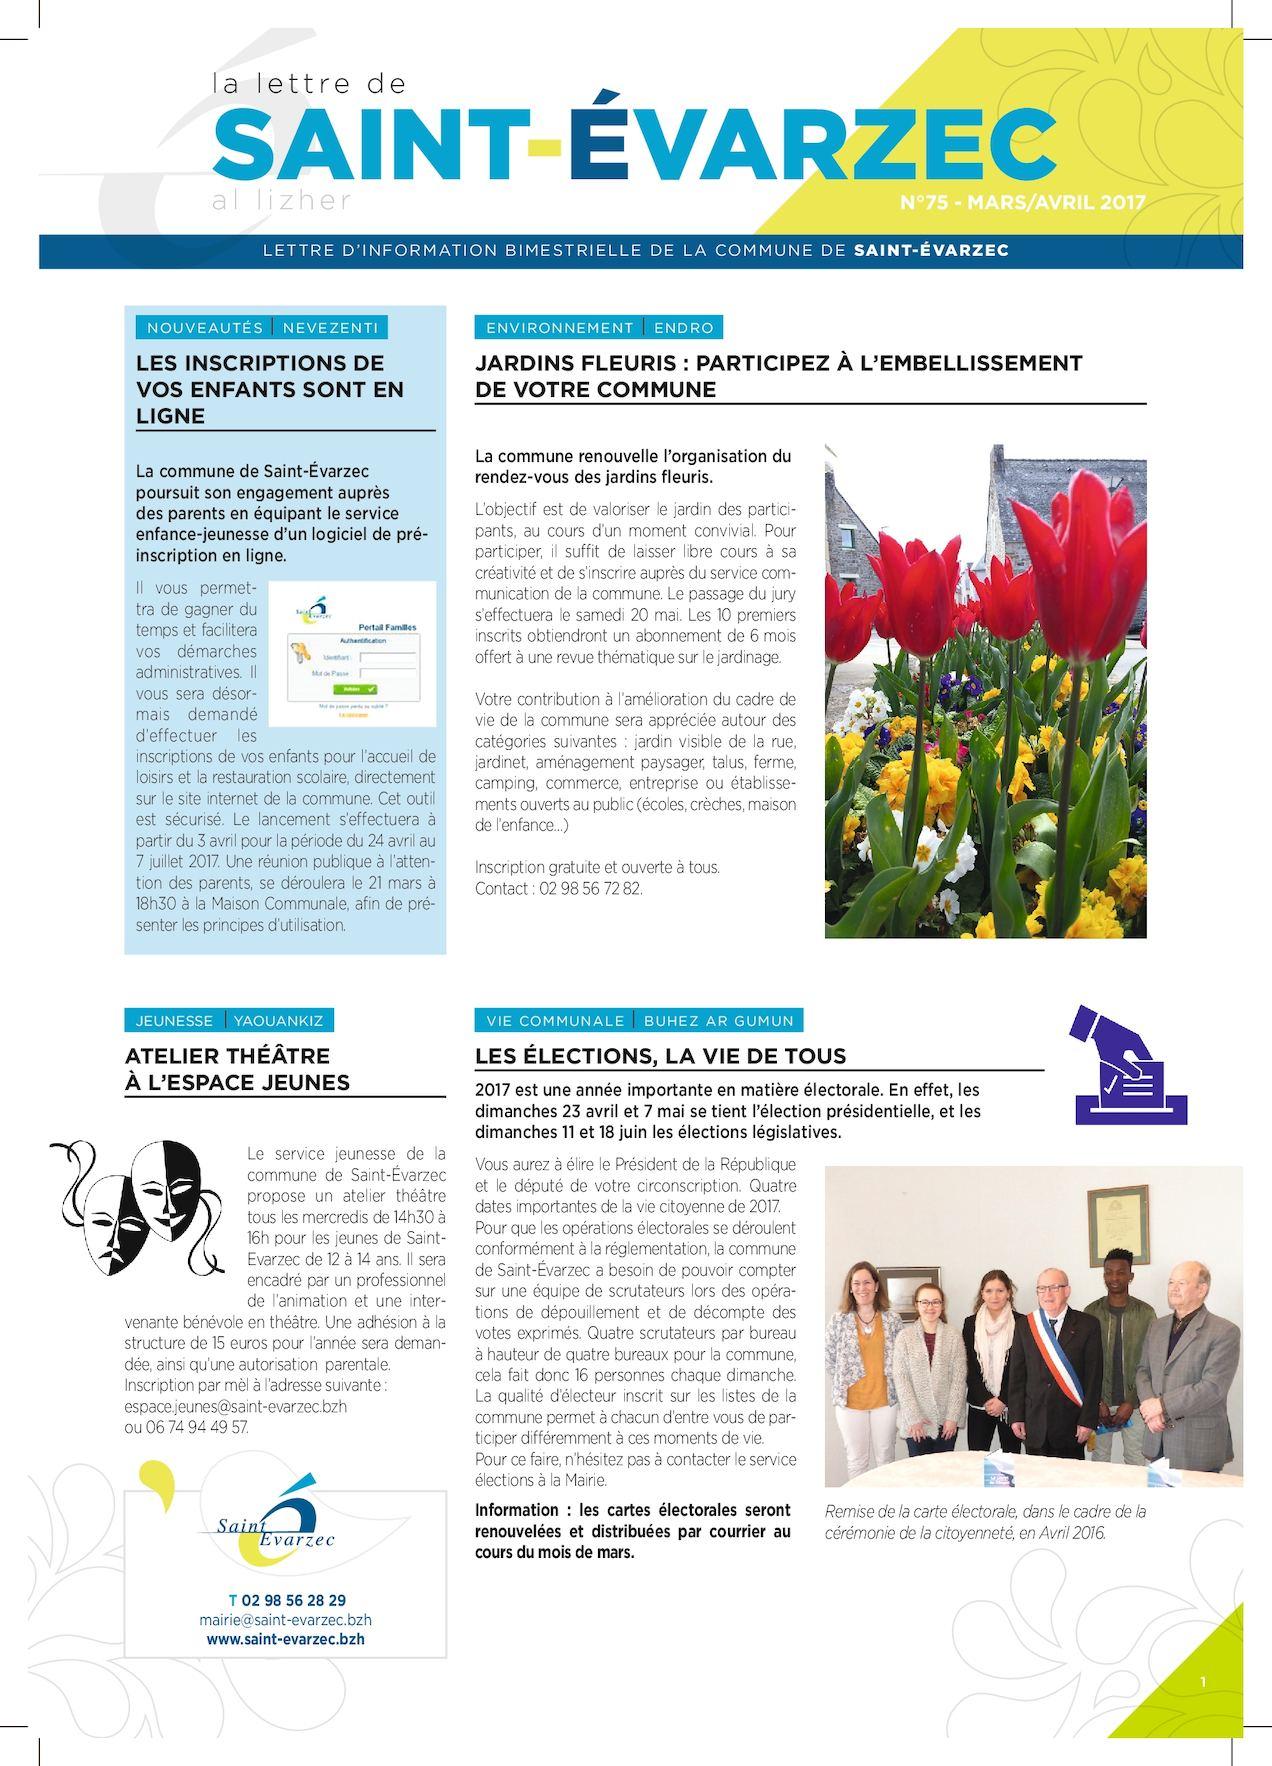 Calam o 49333 mairie saint evarzec lettre mars avril for Entreprise jardinage